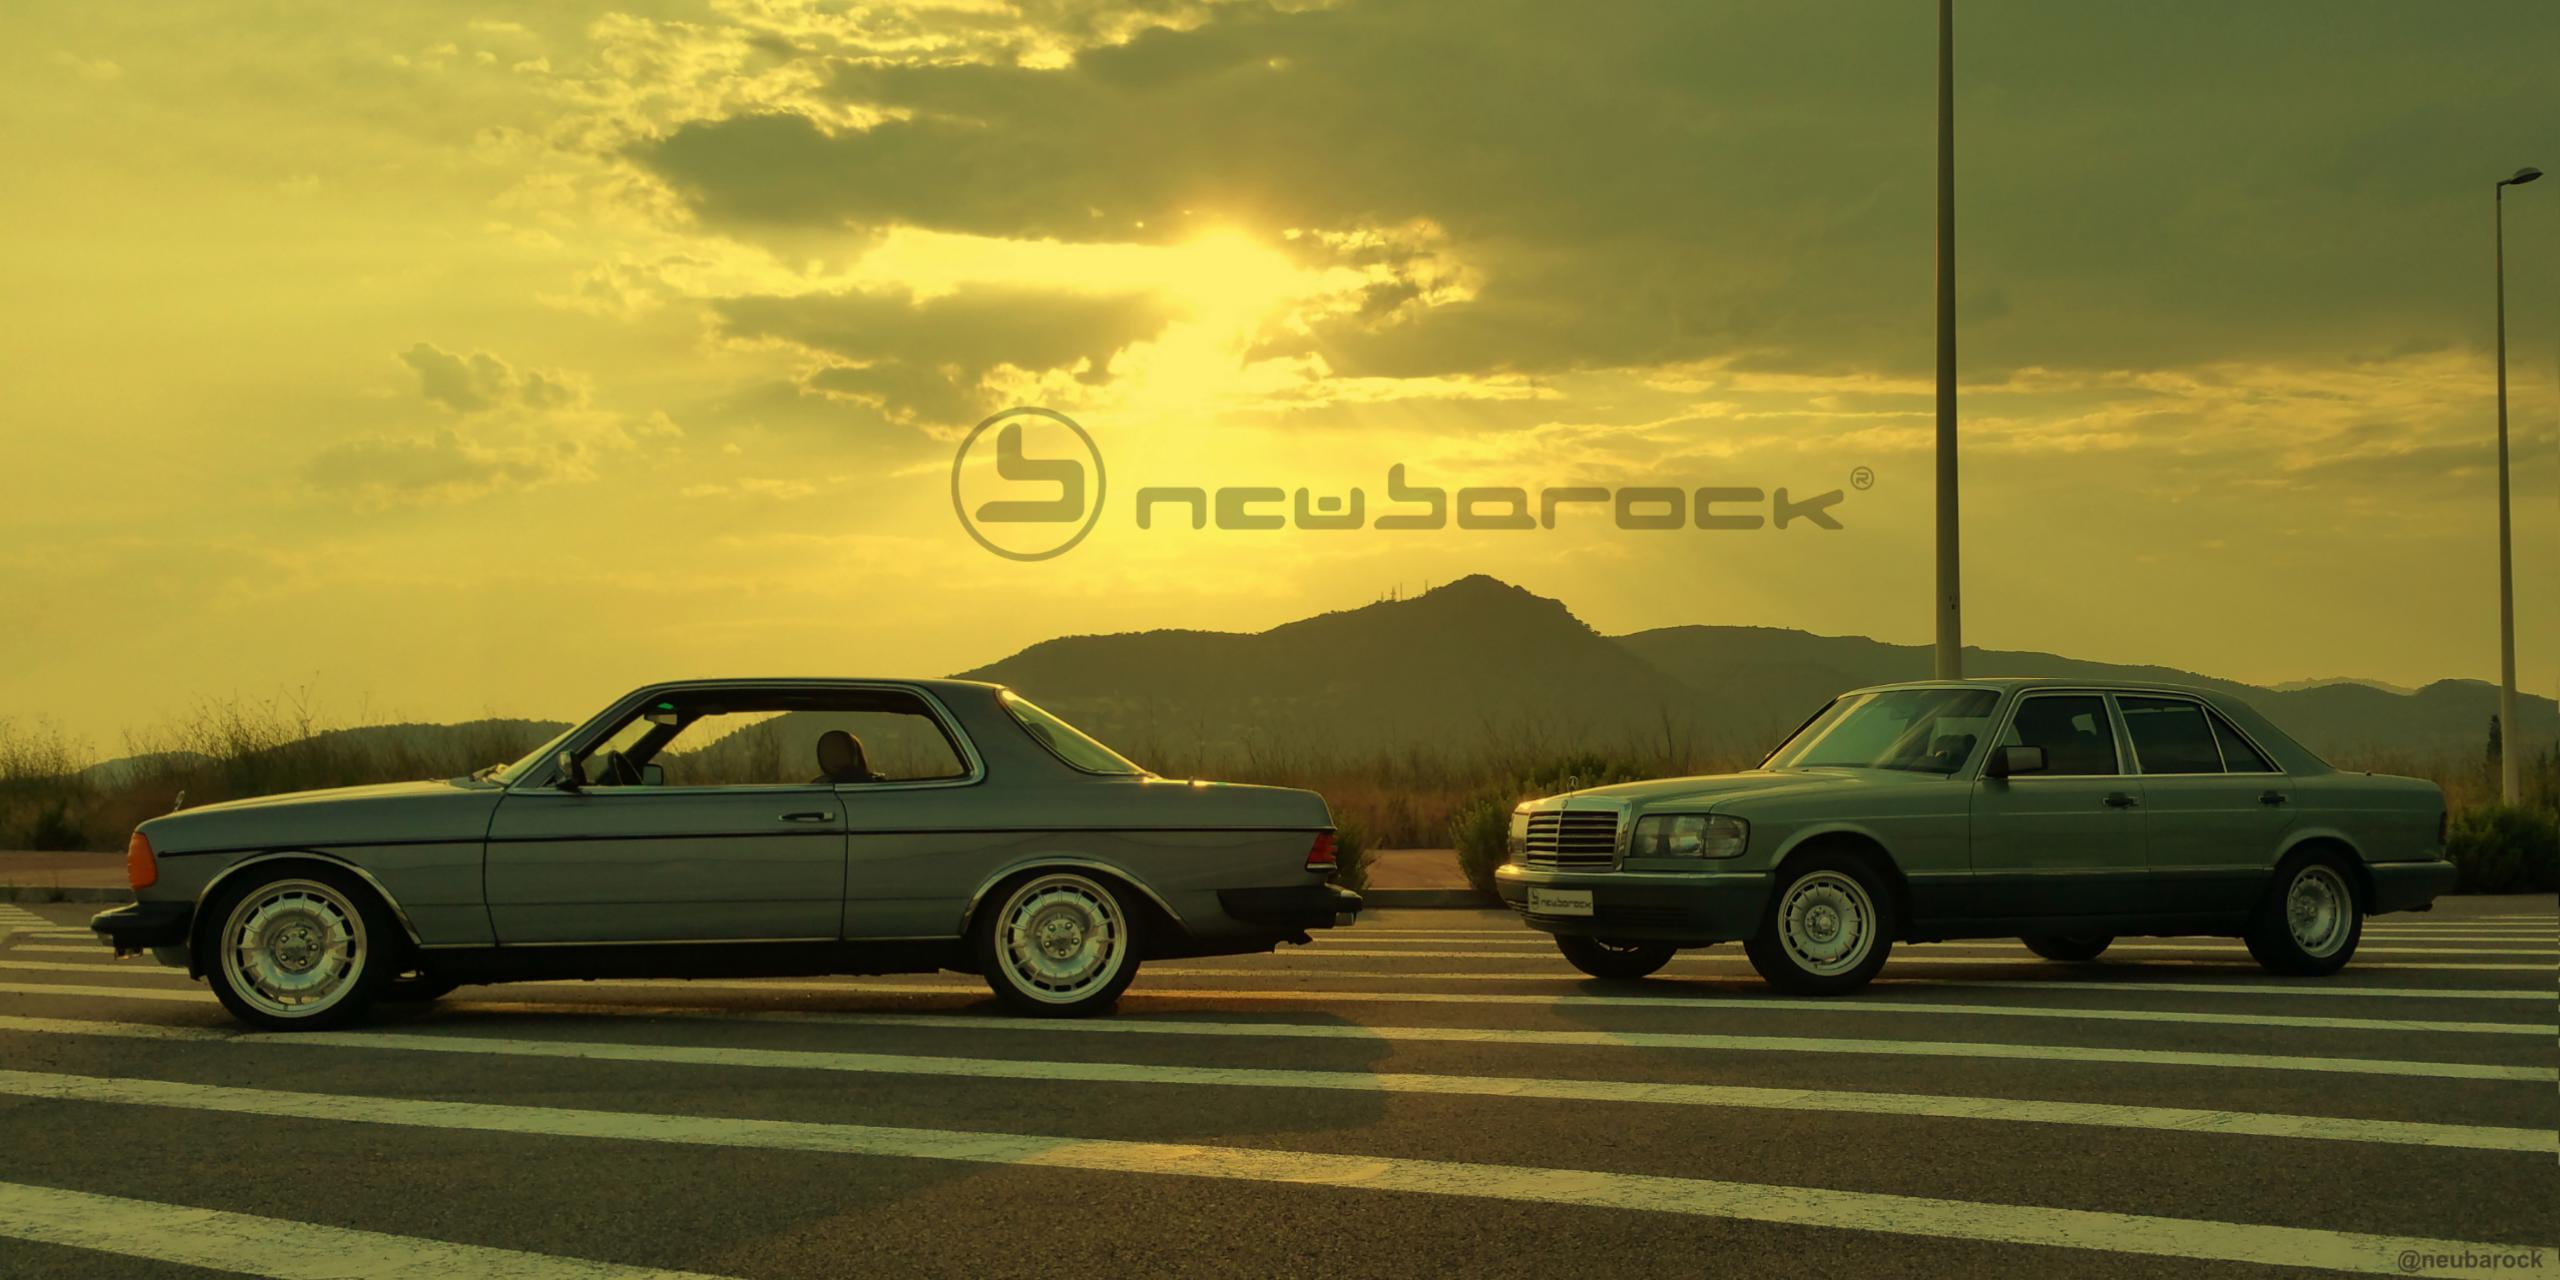 C123 US version with the 8x18 neuBarock®